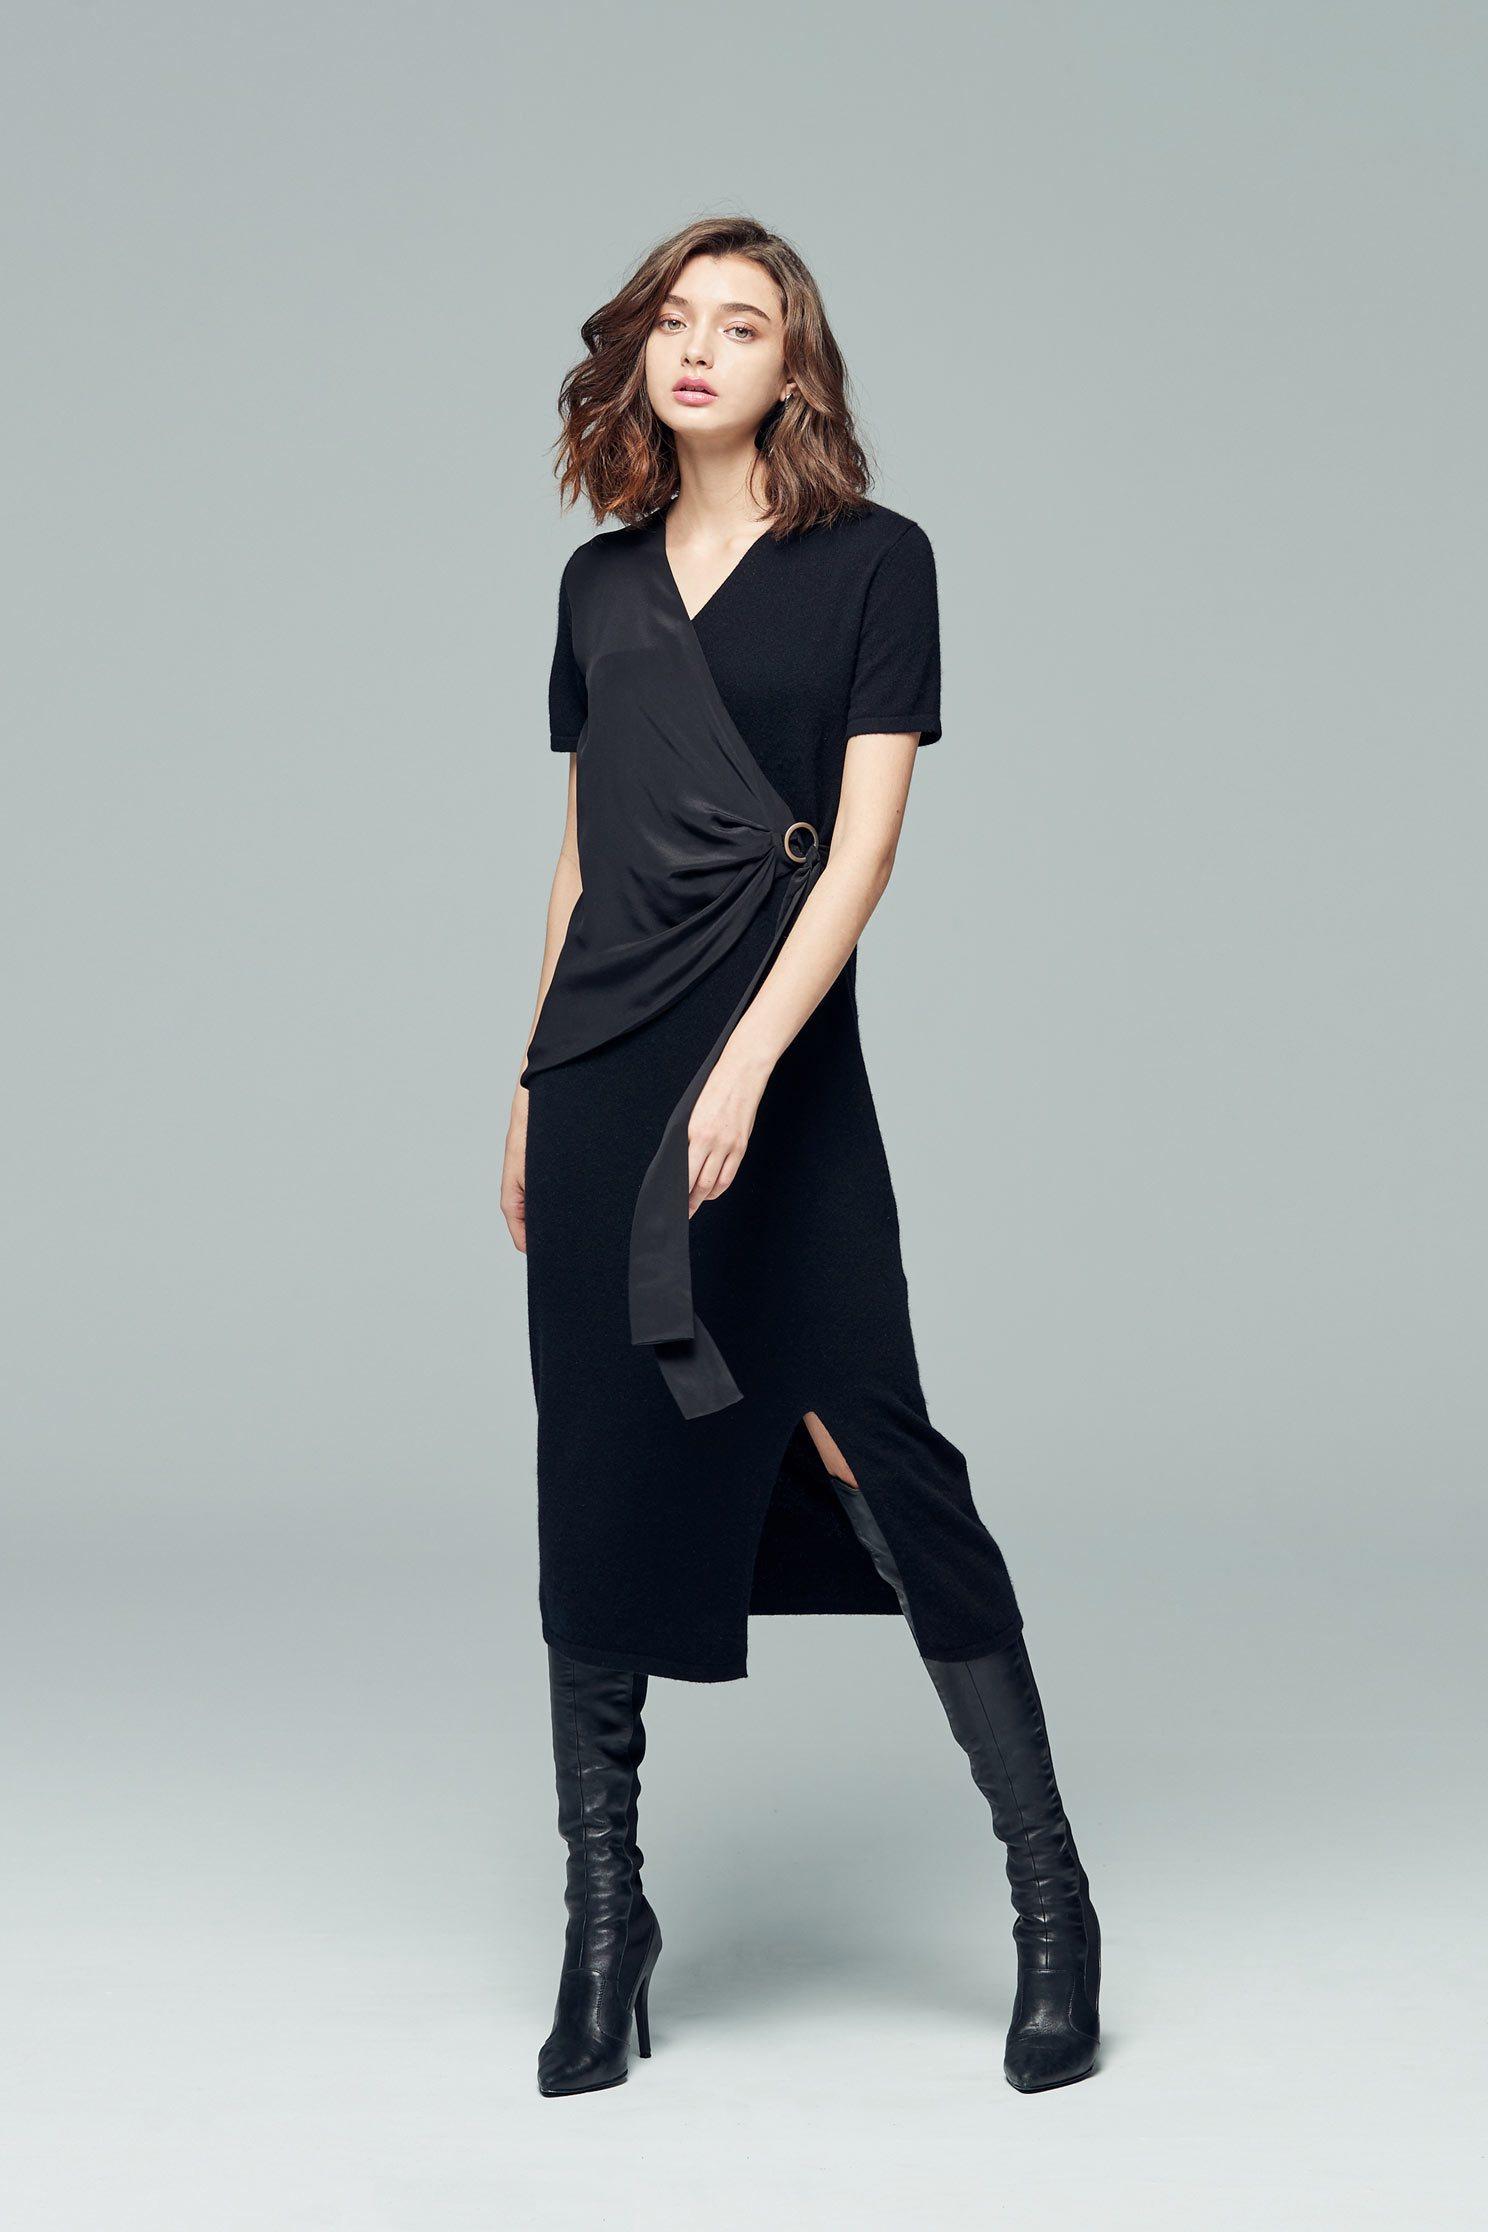 Elegant plain color dress